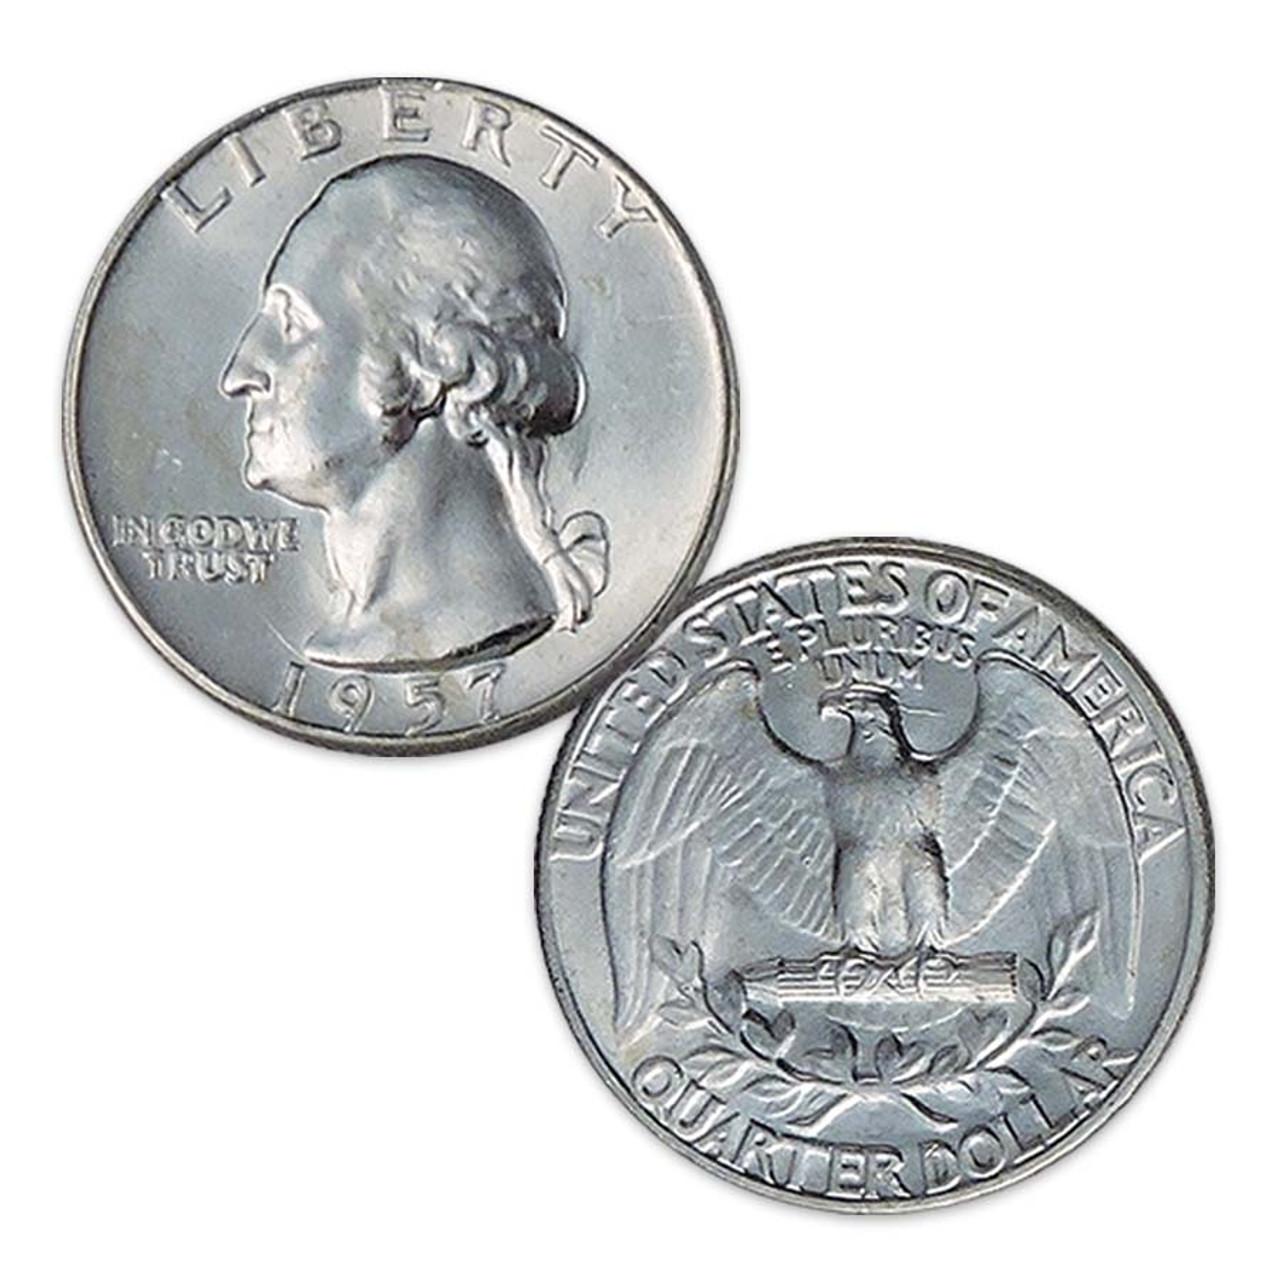 1957-P Washington Silver Quarter Brilliant Uncirculated Image 1